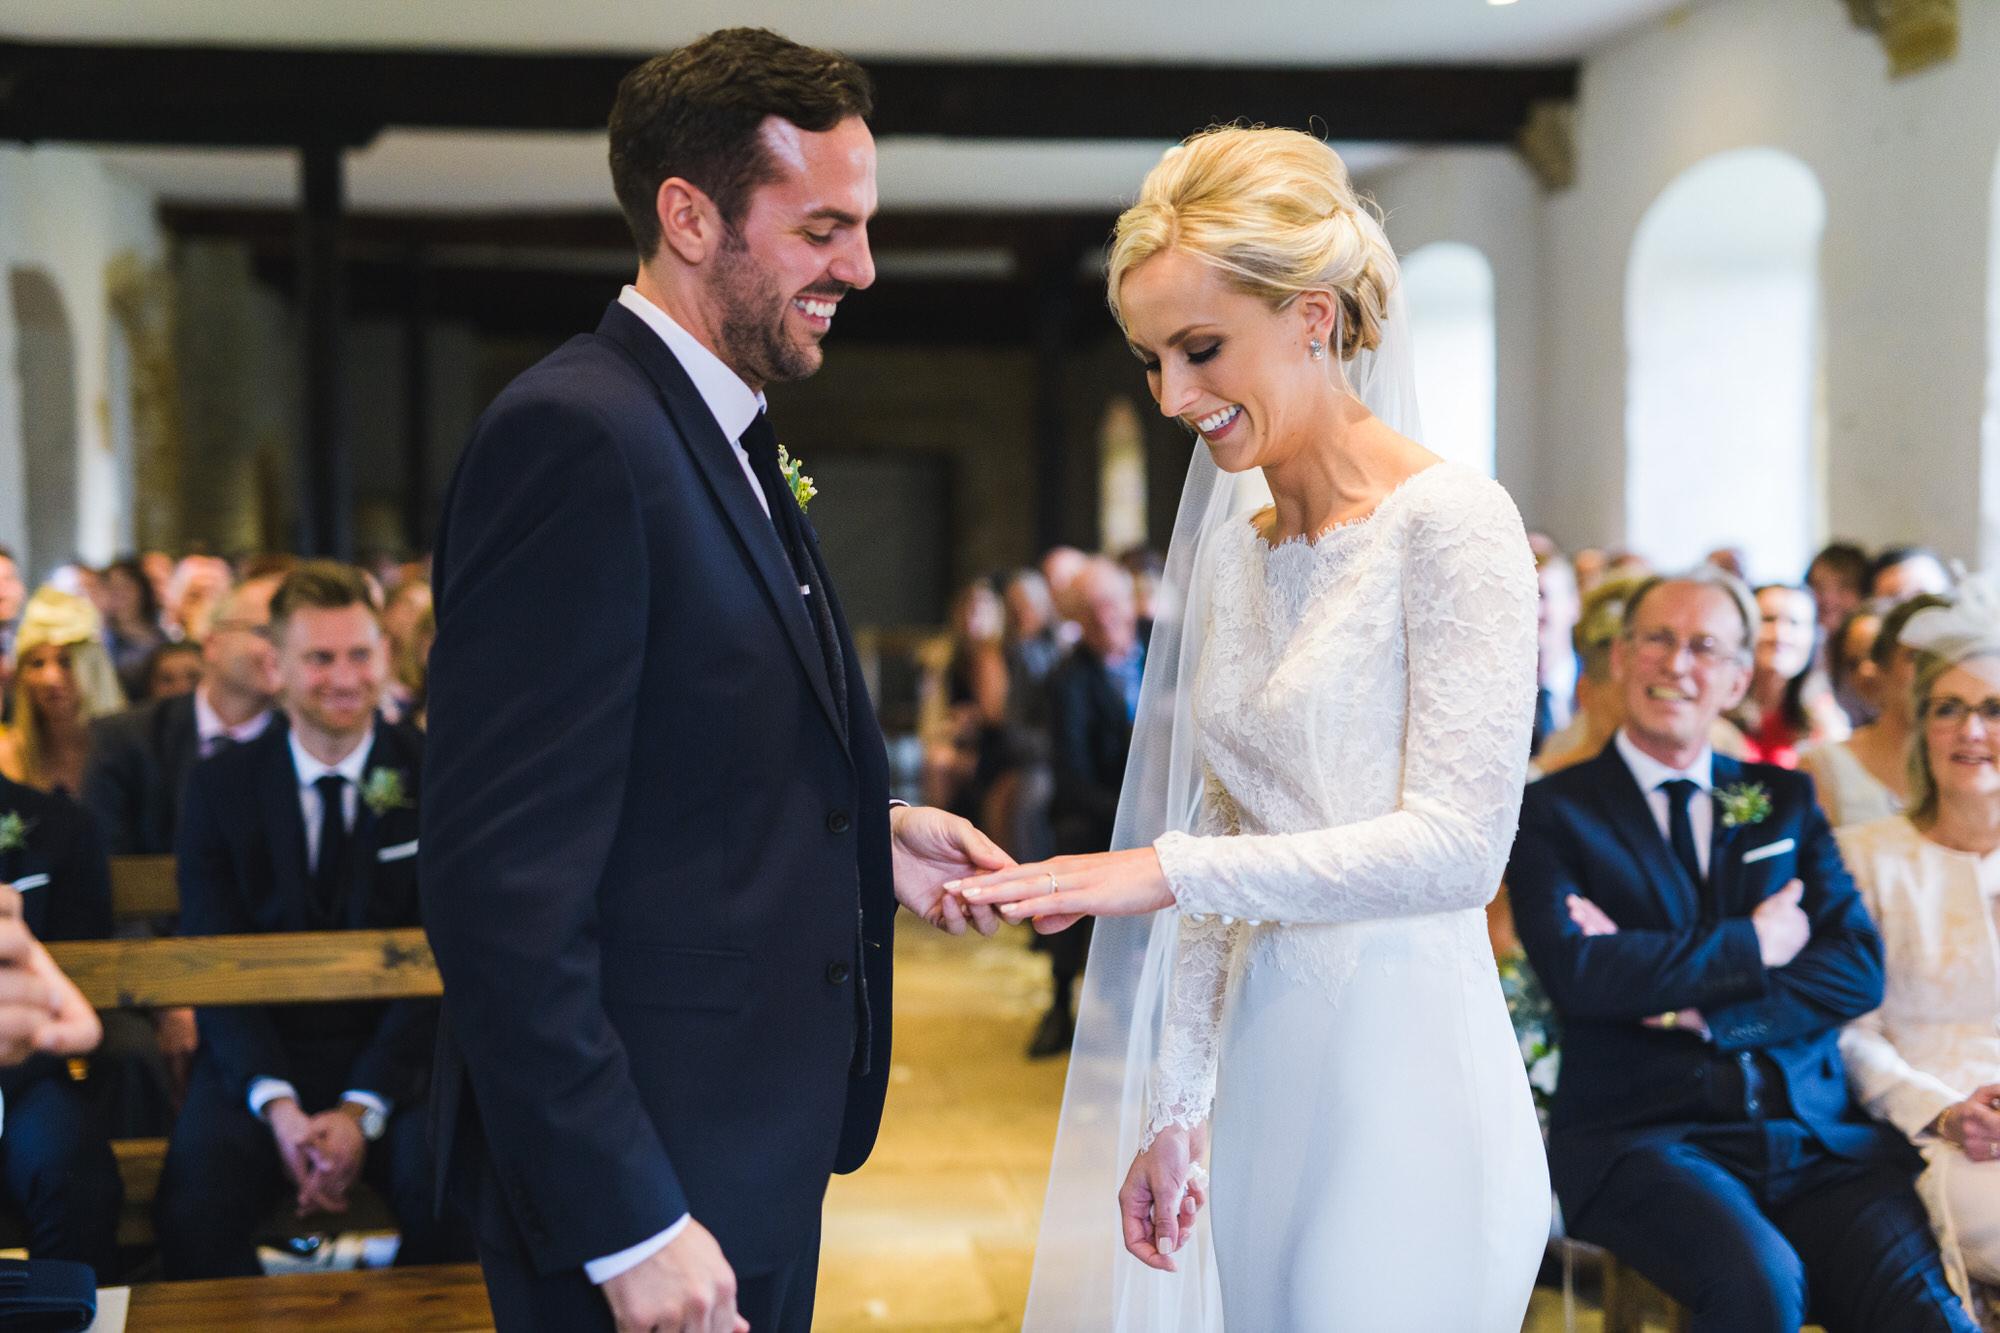 Brympton House wedding ceremony  by simon biffen photography 21